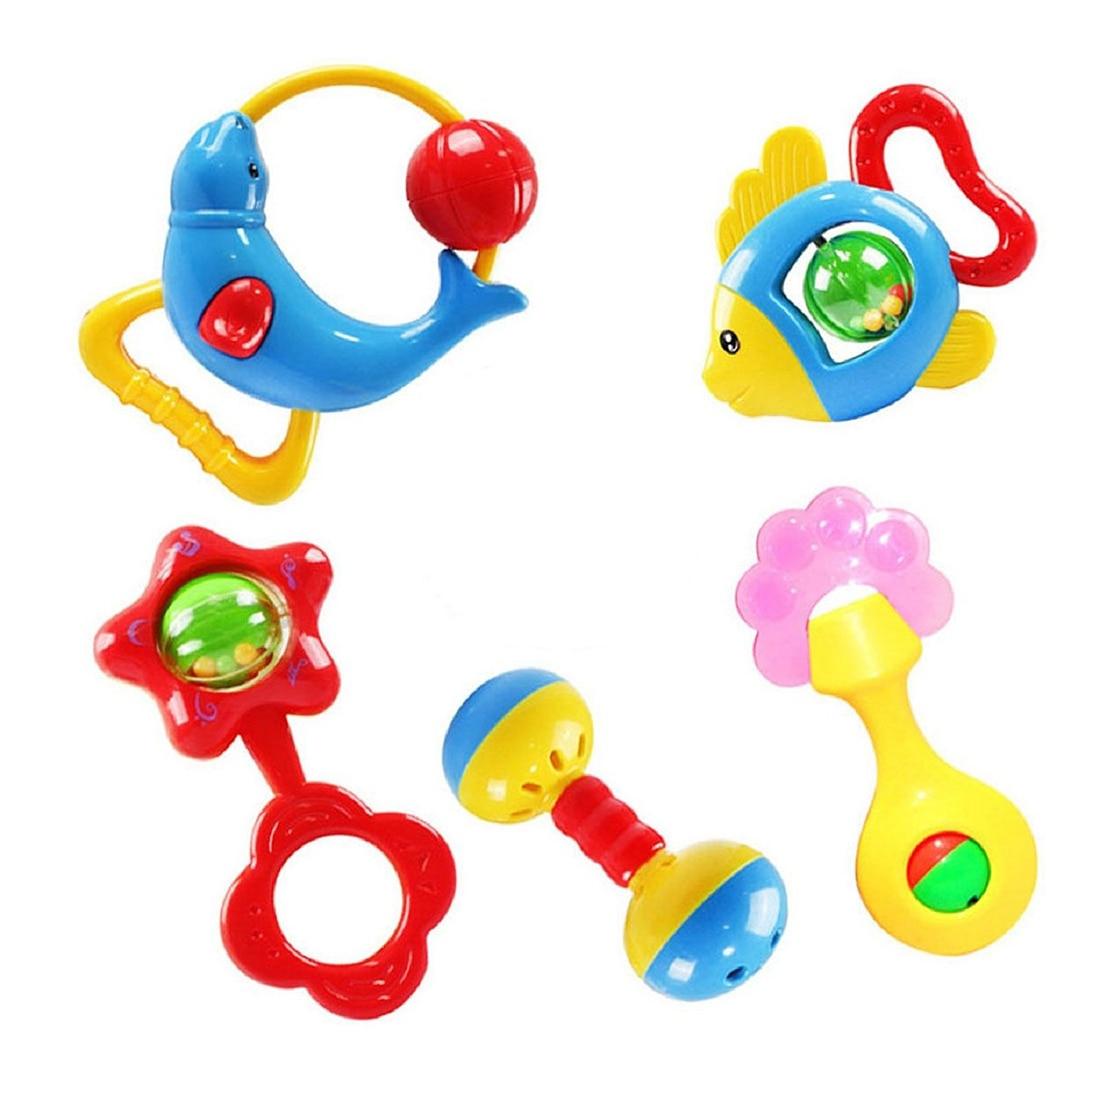 Christmas gift 5 pcs animal bells lovely rattle development toy for kids baby